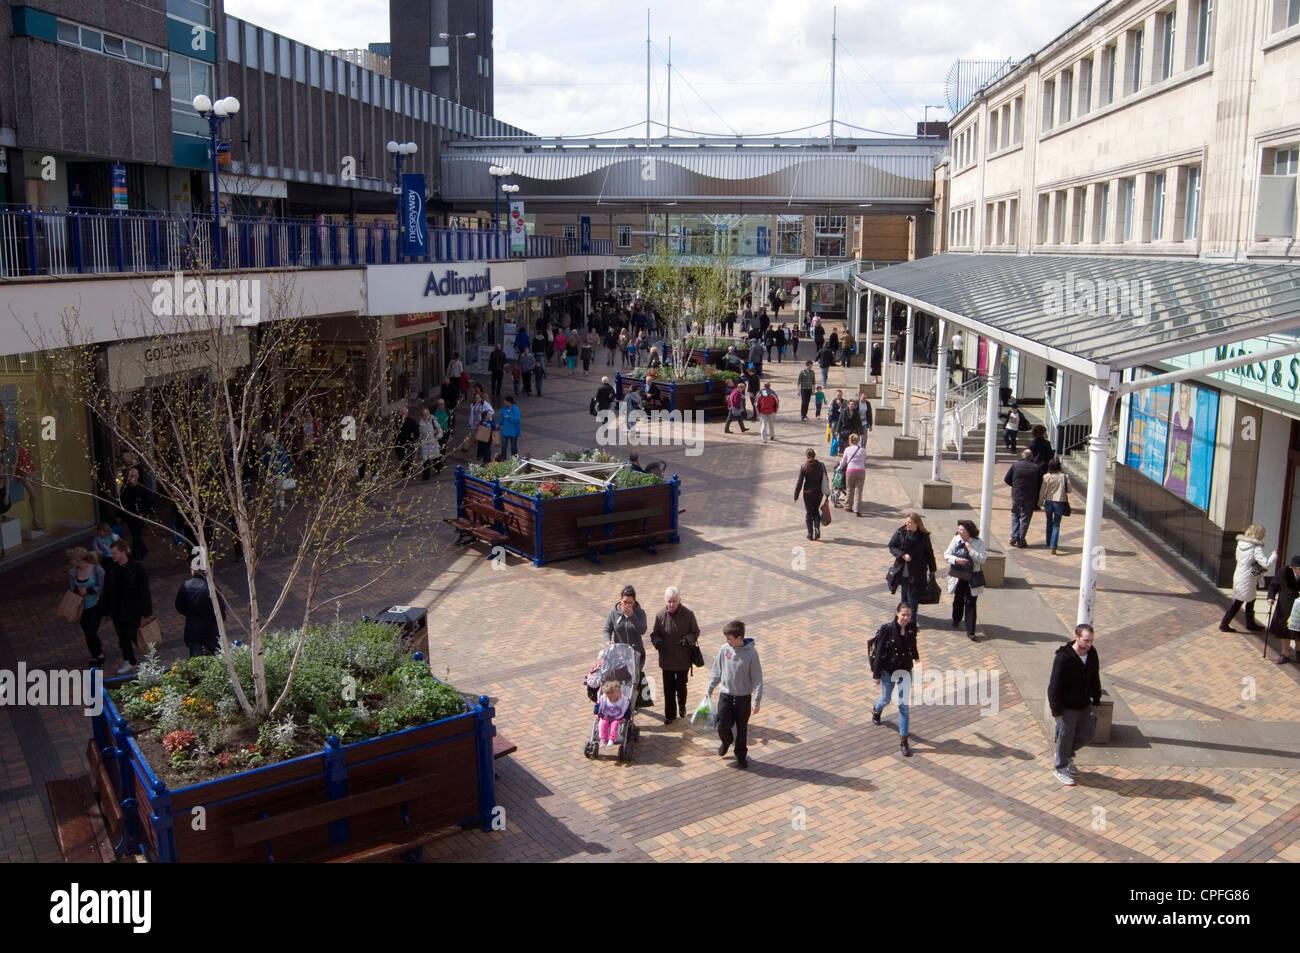 Stockport shopping precinct Mersey Way Shopping Centre town center open air pedestrianized - Stock Image